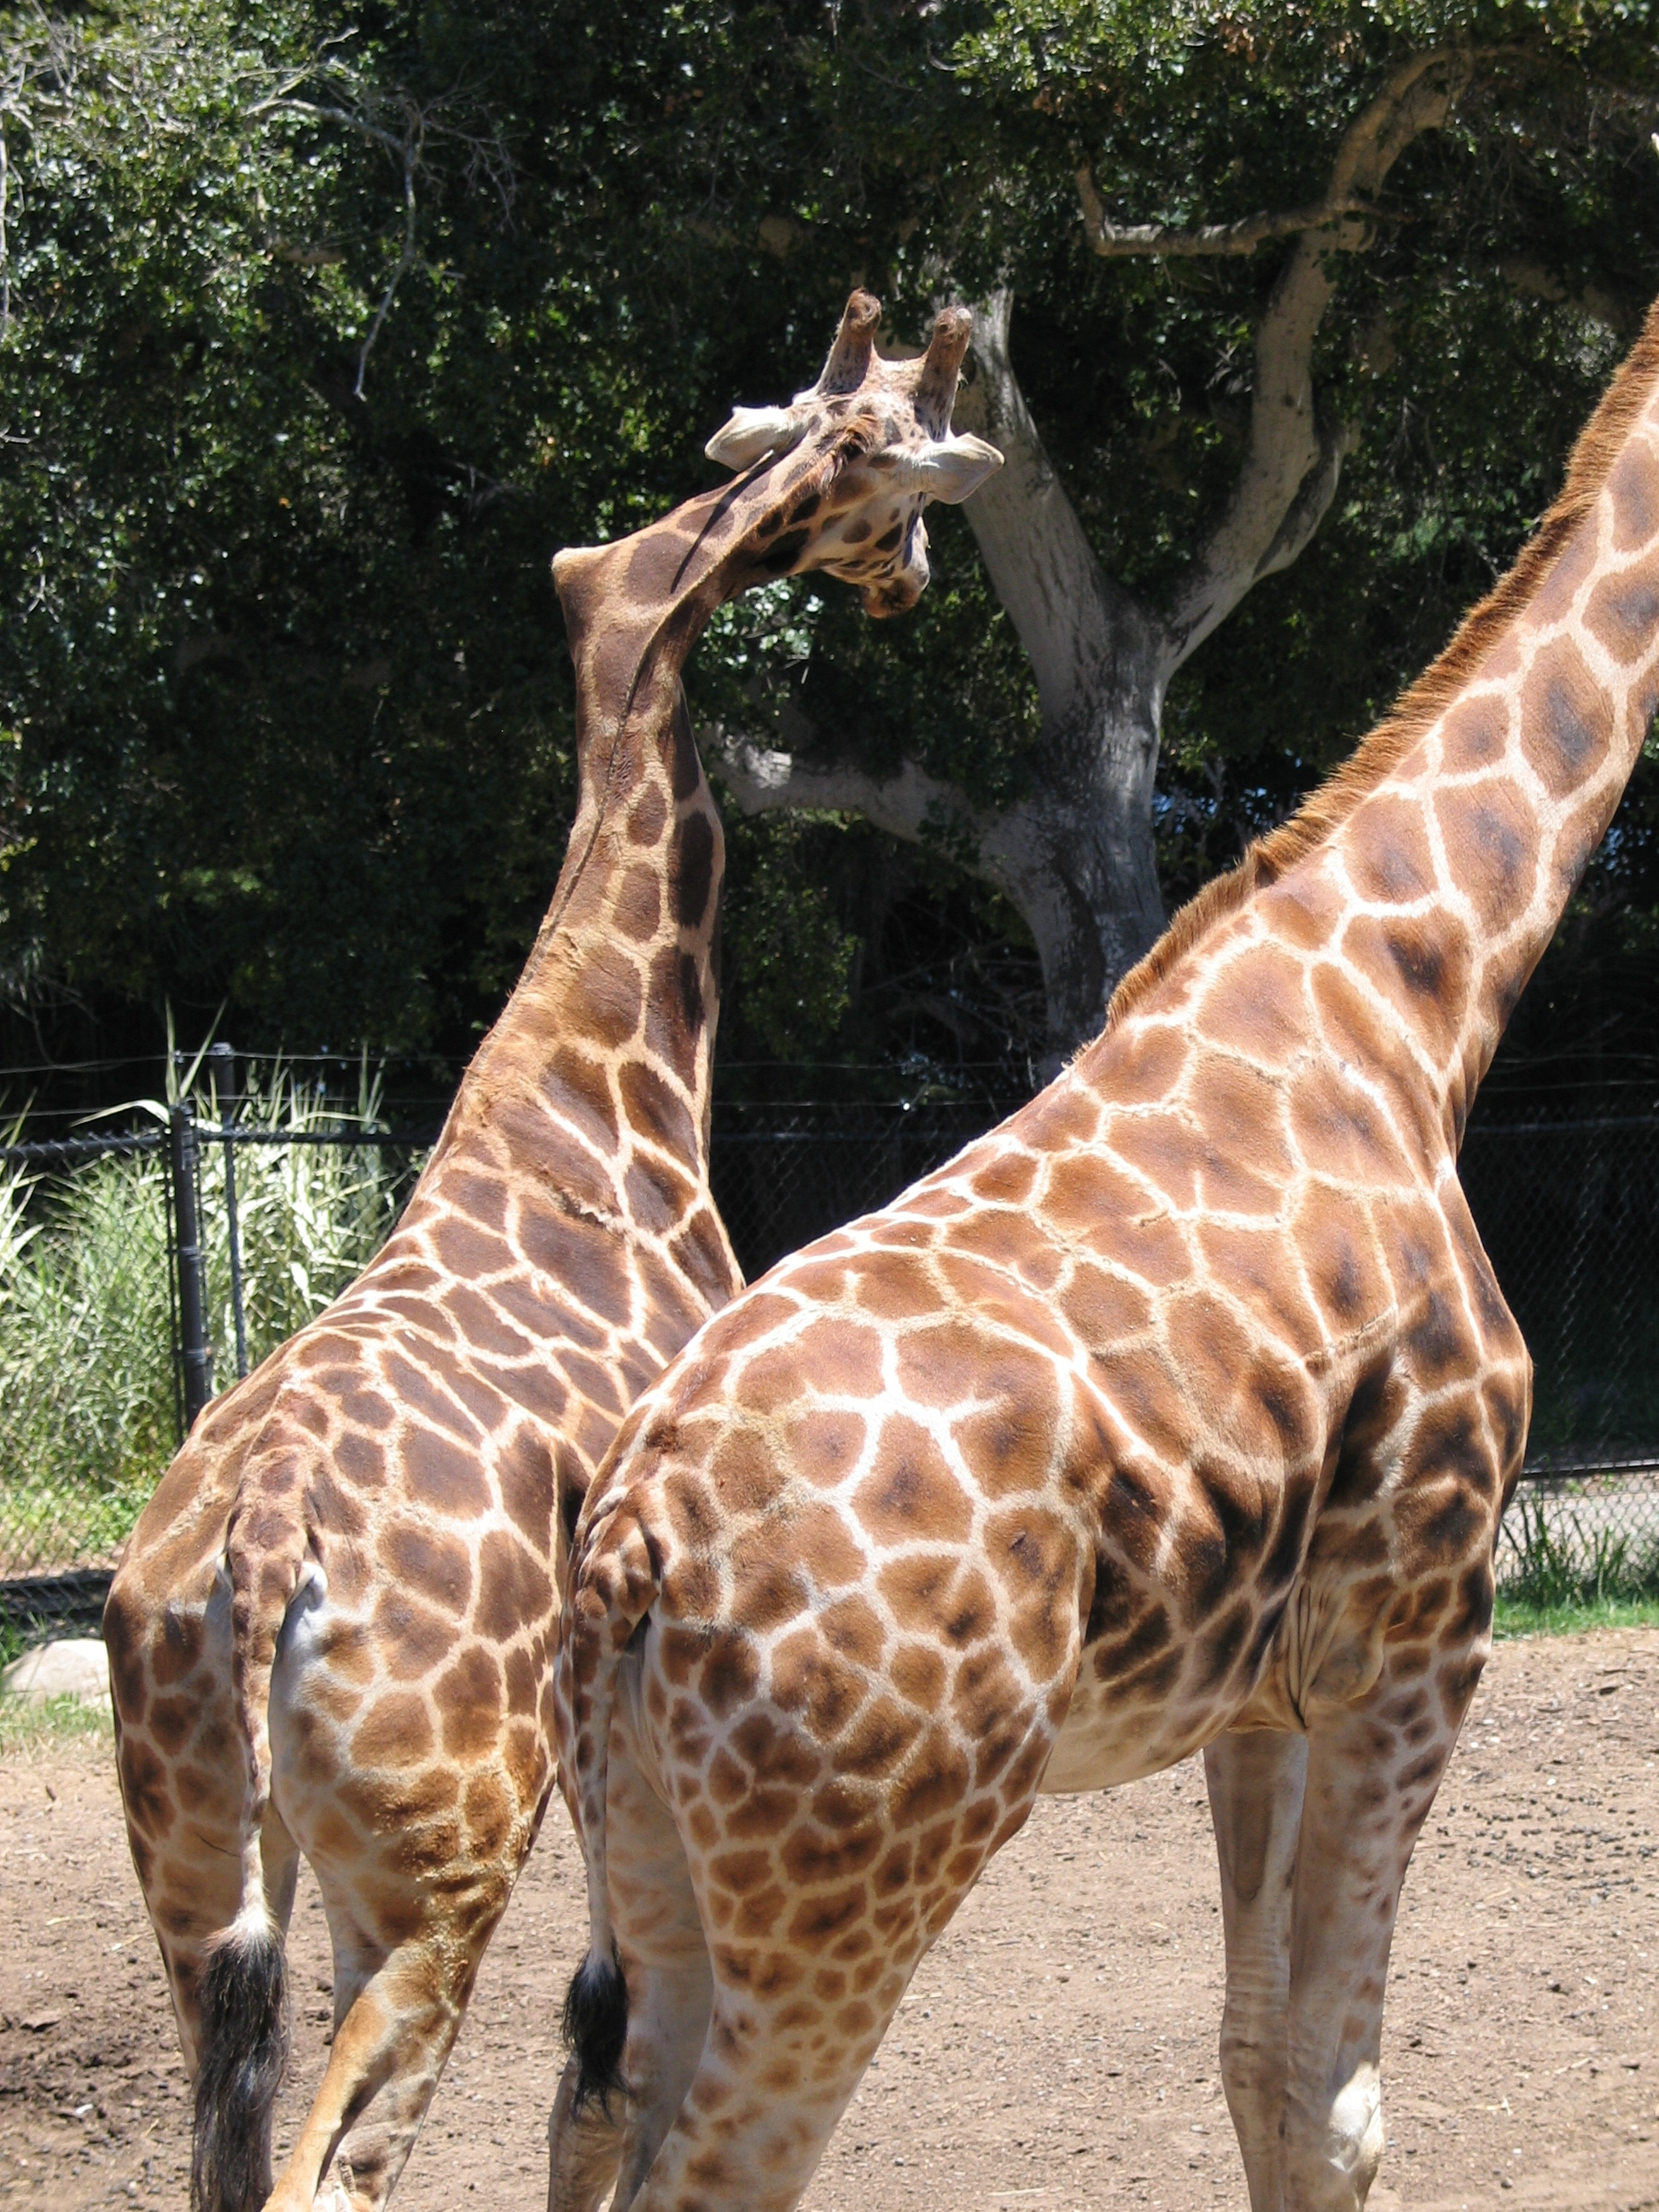 Giraffes sleeping pics permalink pooptronica Image collections